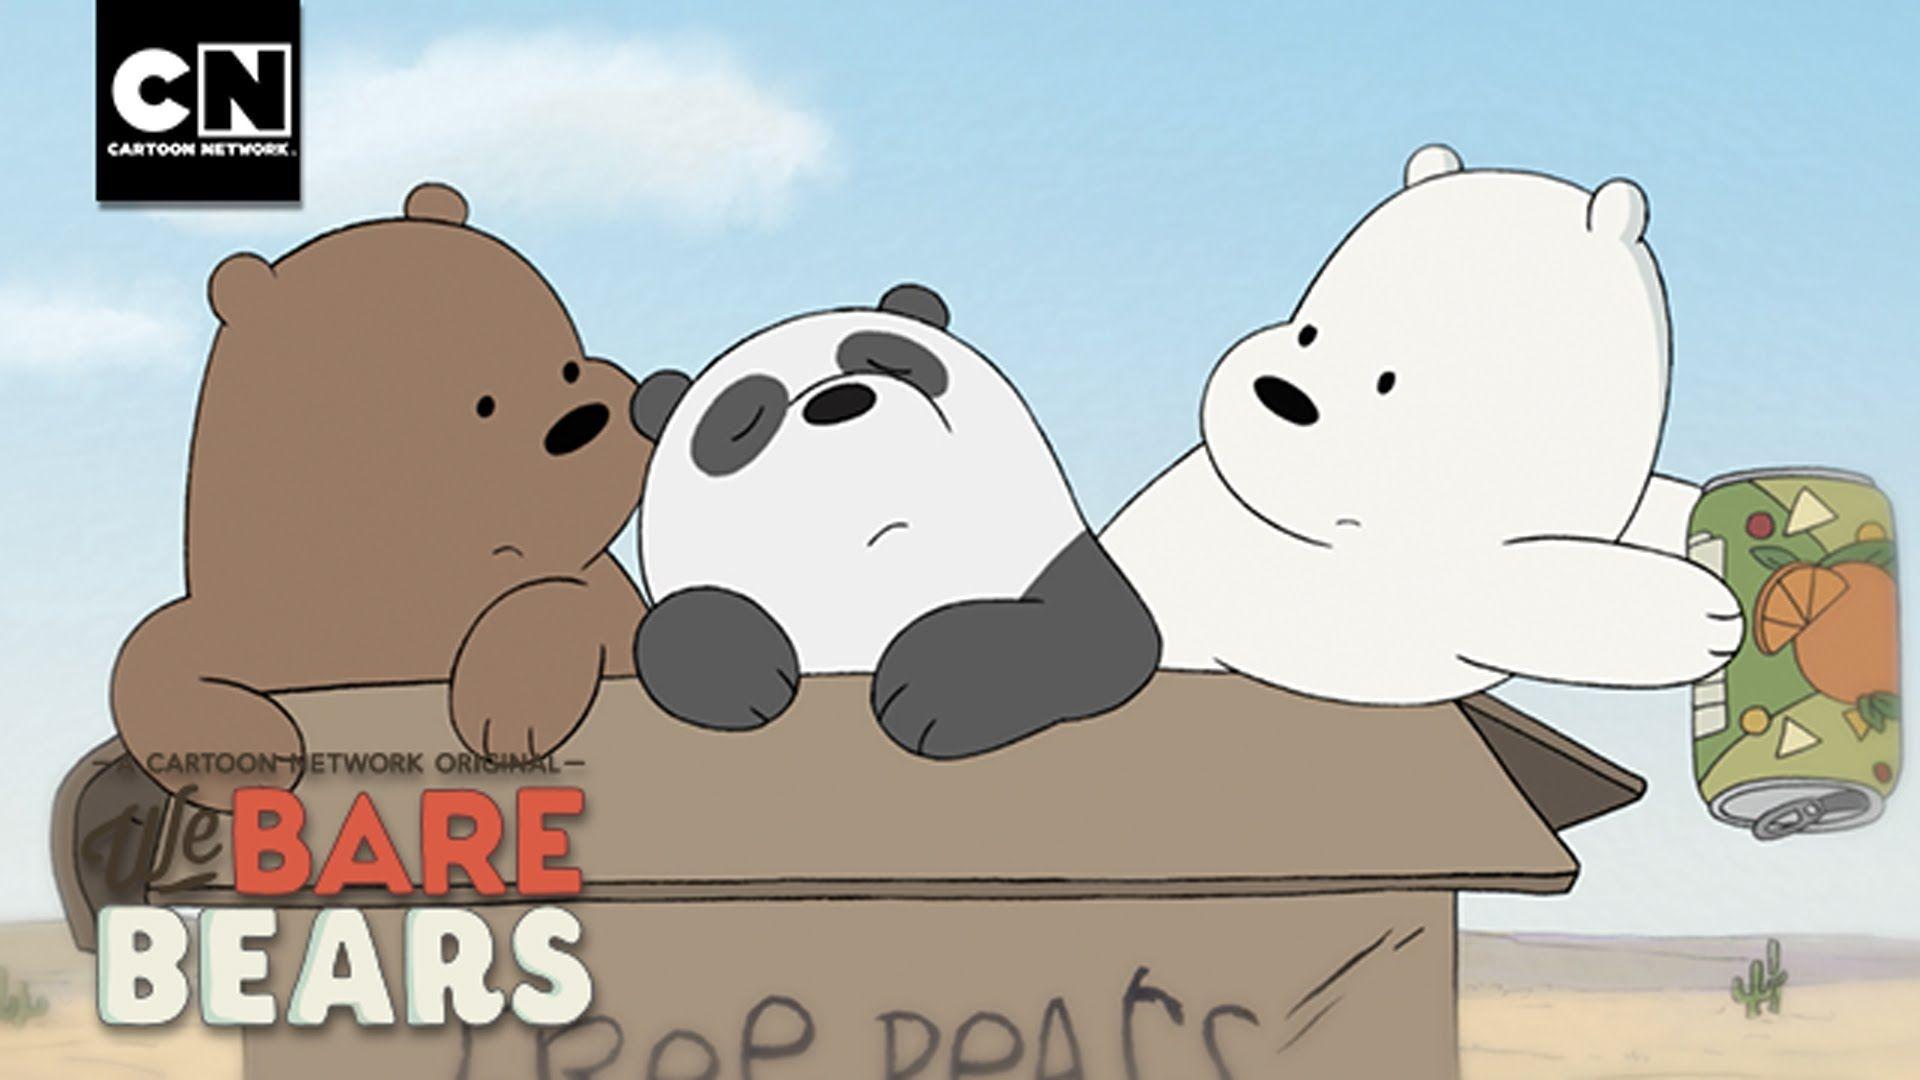 we bare bears christmas wallpaper - photo #41